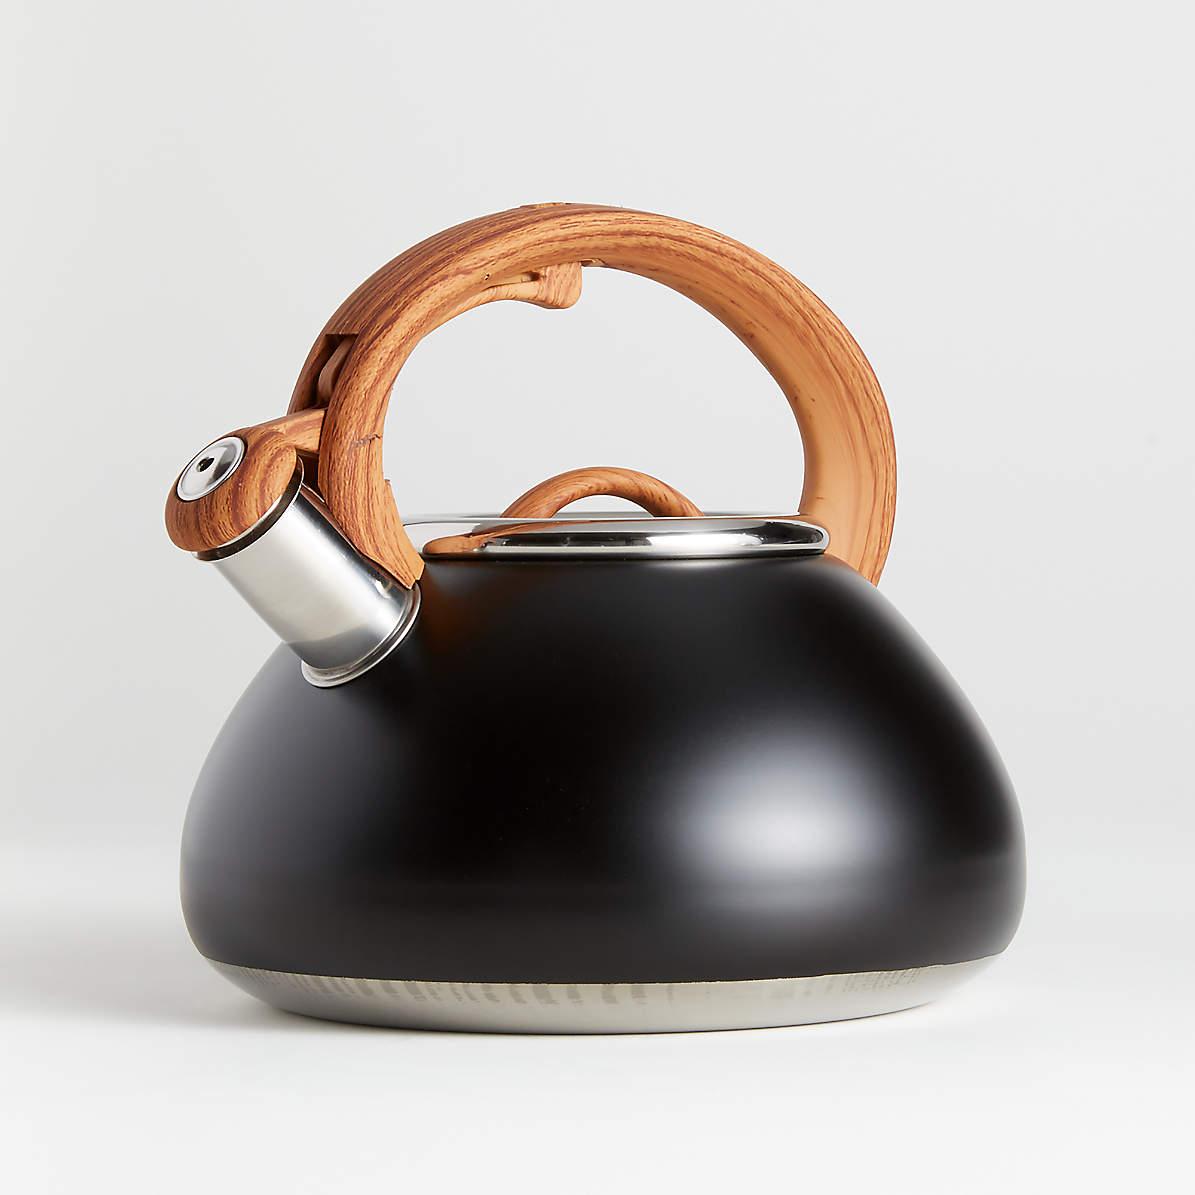 Primula Matte Black Tea Kettle With Wood Look Handle Reviews Crate And Barrel Wallpaper autumn hand picnic tea kettle